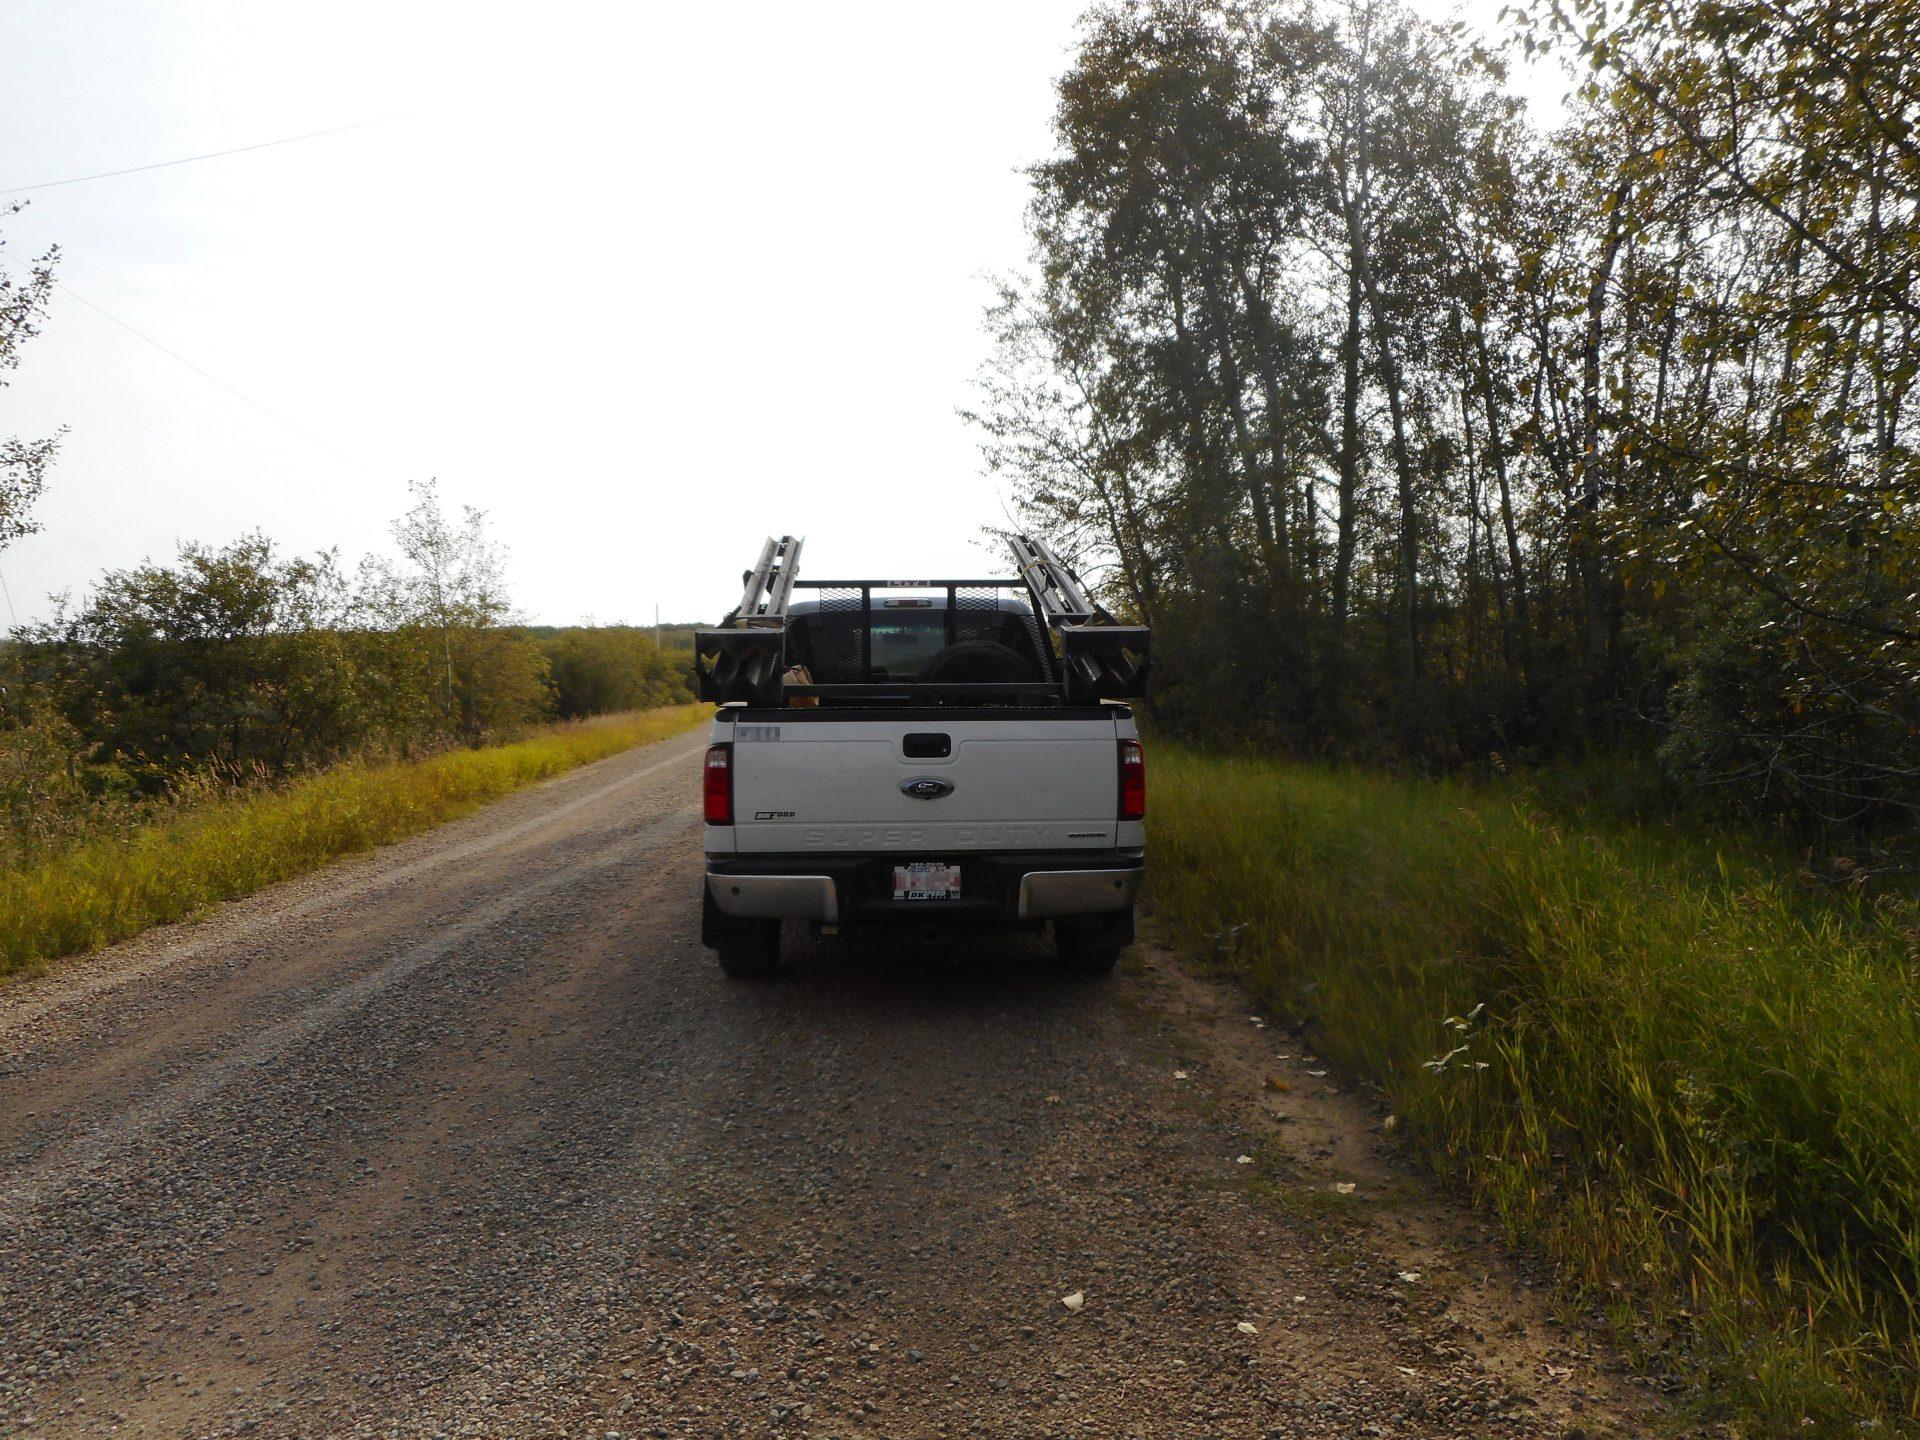 Elk Point RCMP Asking for Public's Help Finding Stolen Truck